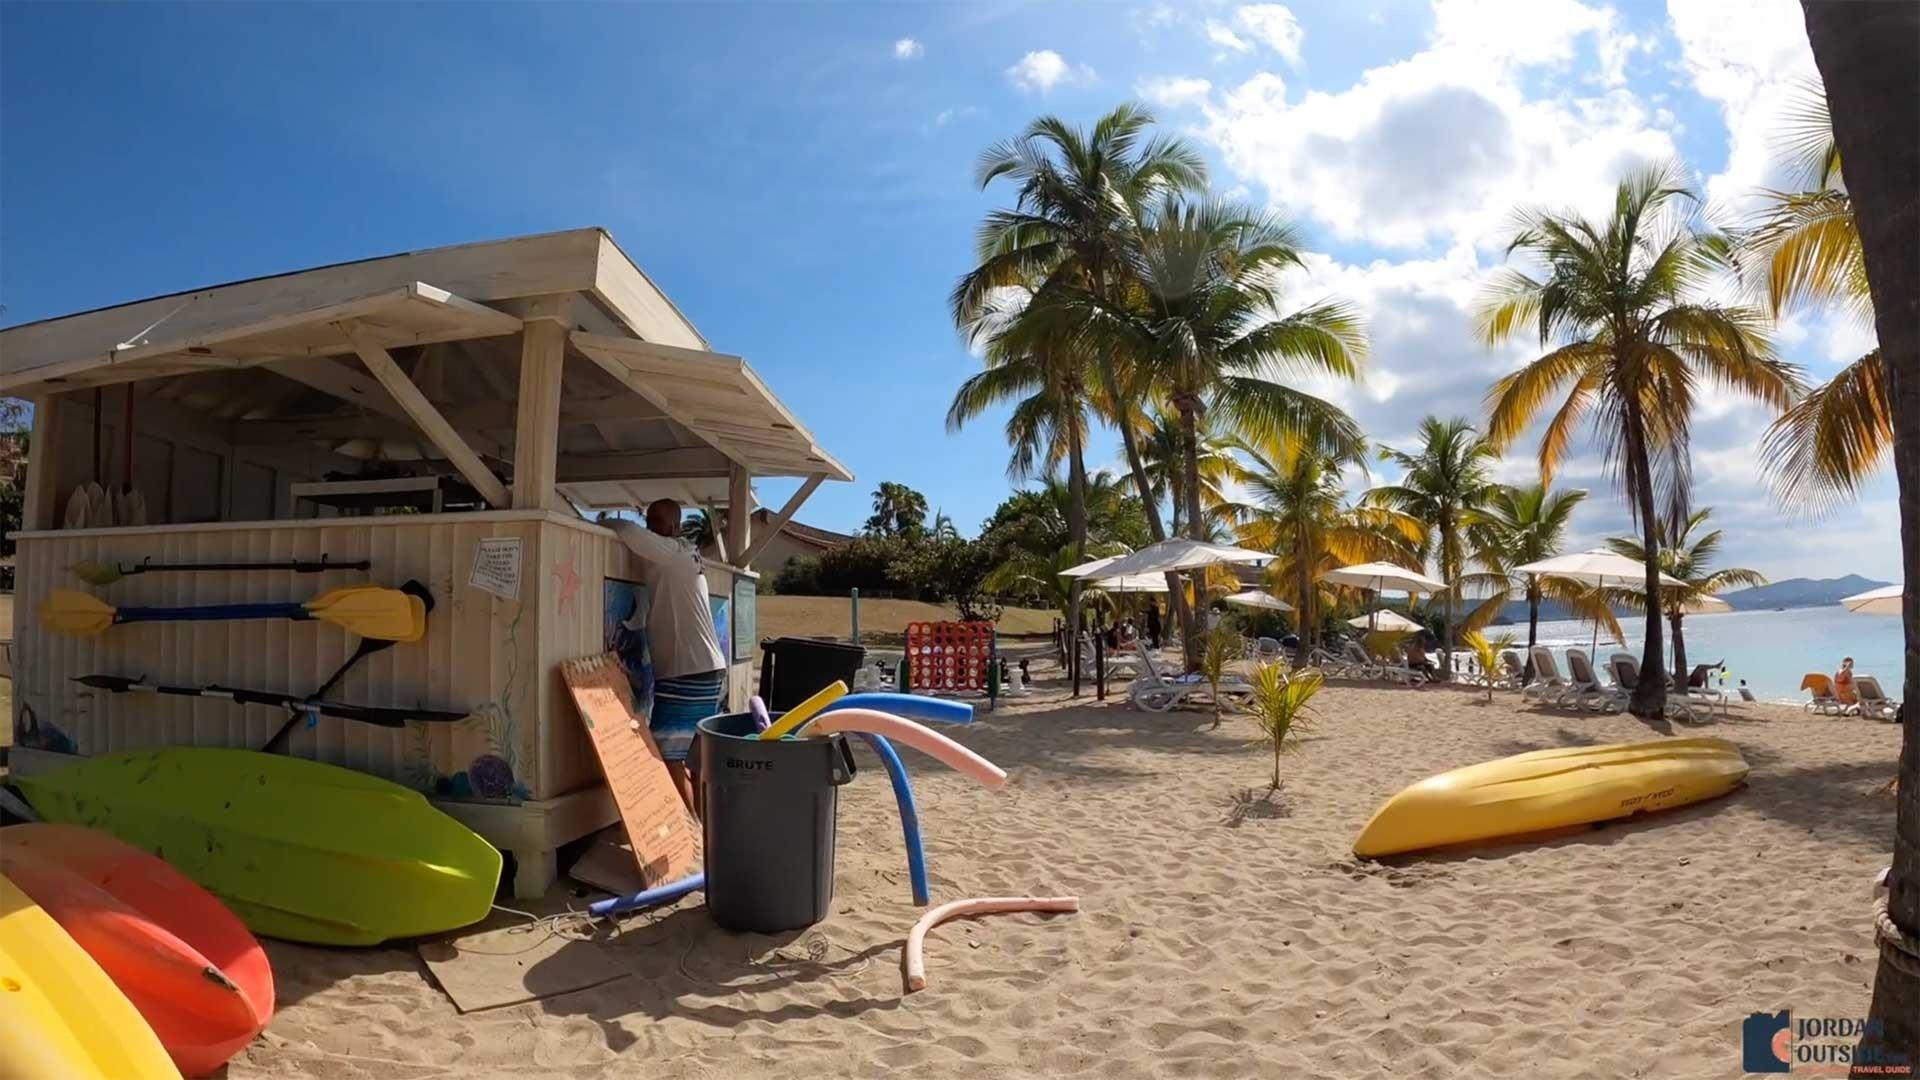 Rental Shack at Mermaid Beach